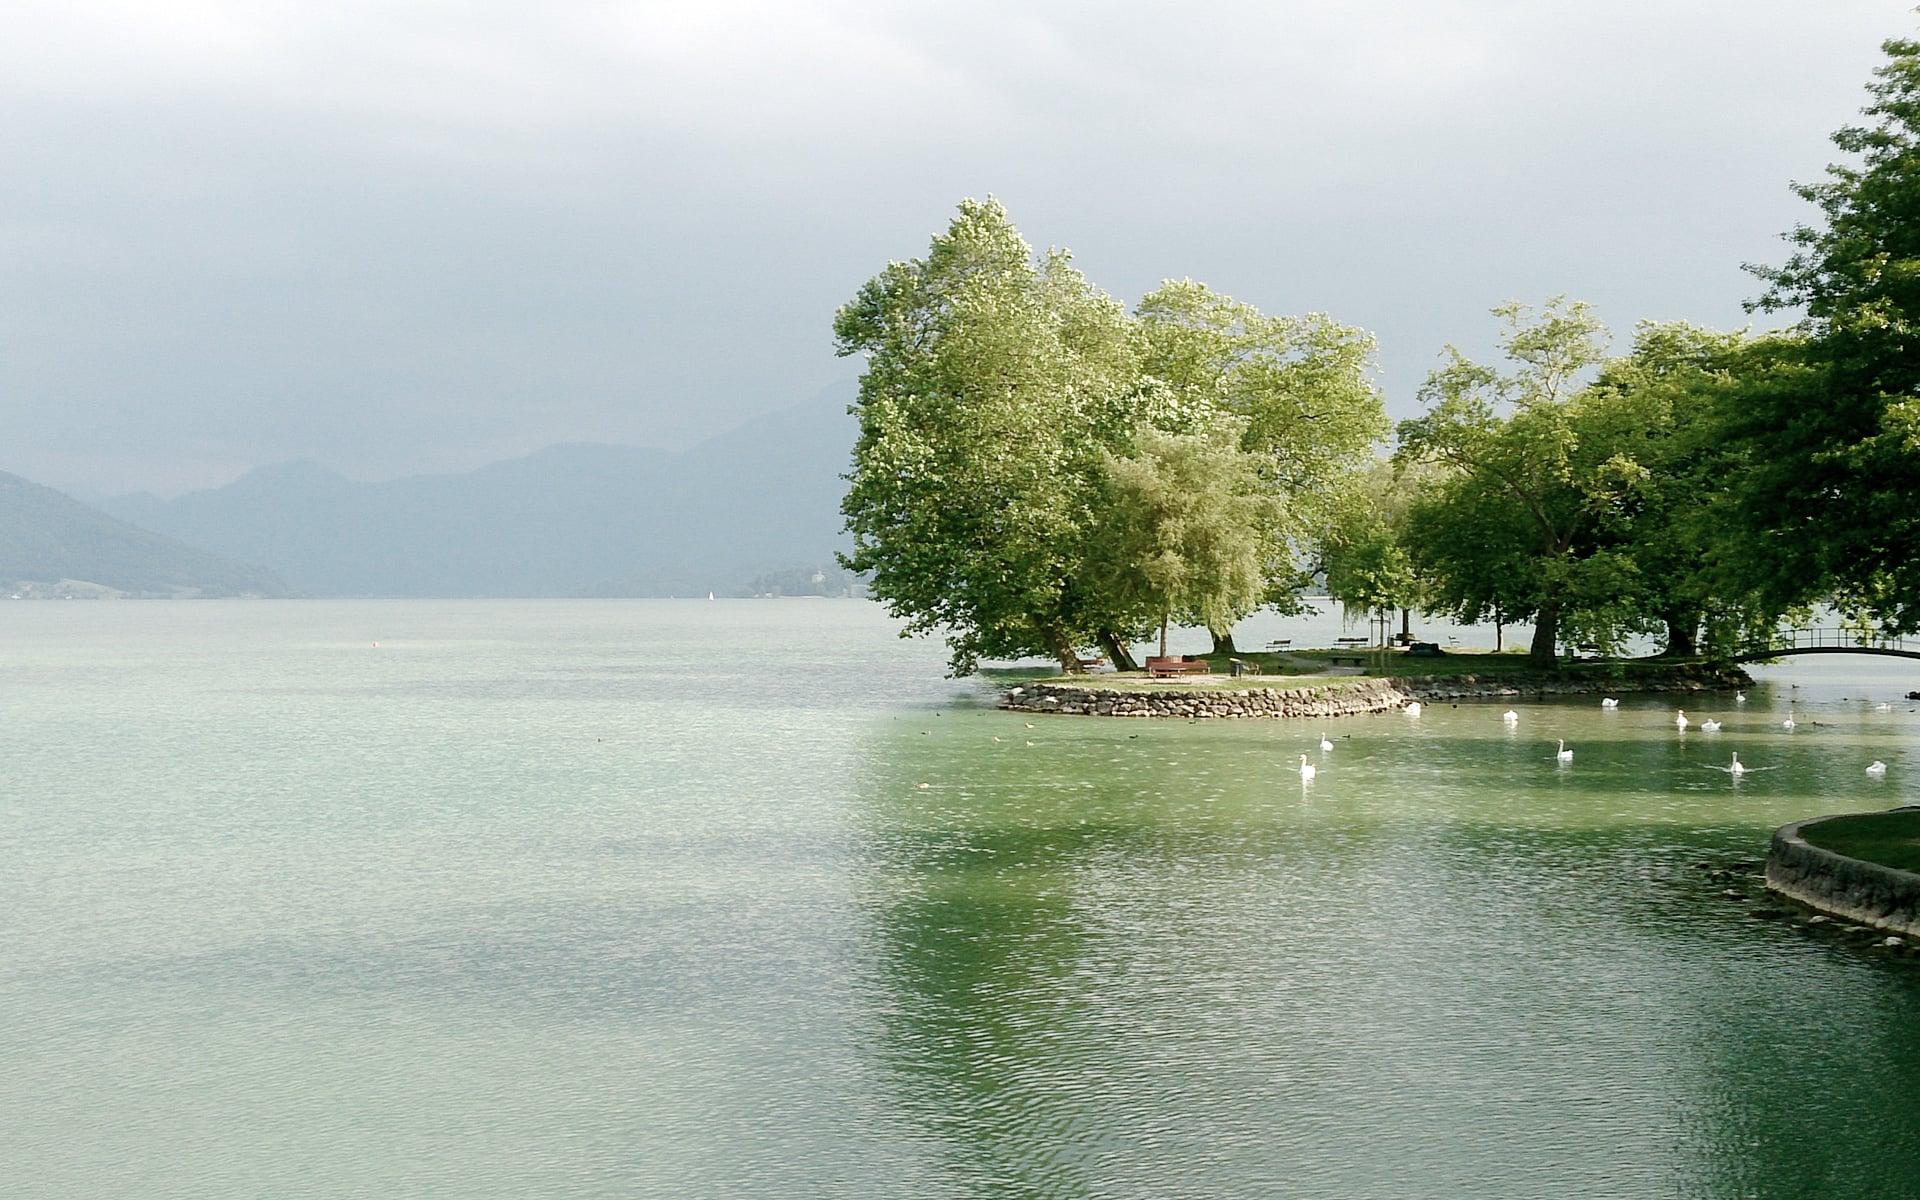 The idyllic Lake Zug in Cham, Switzerland